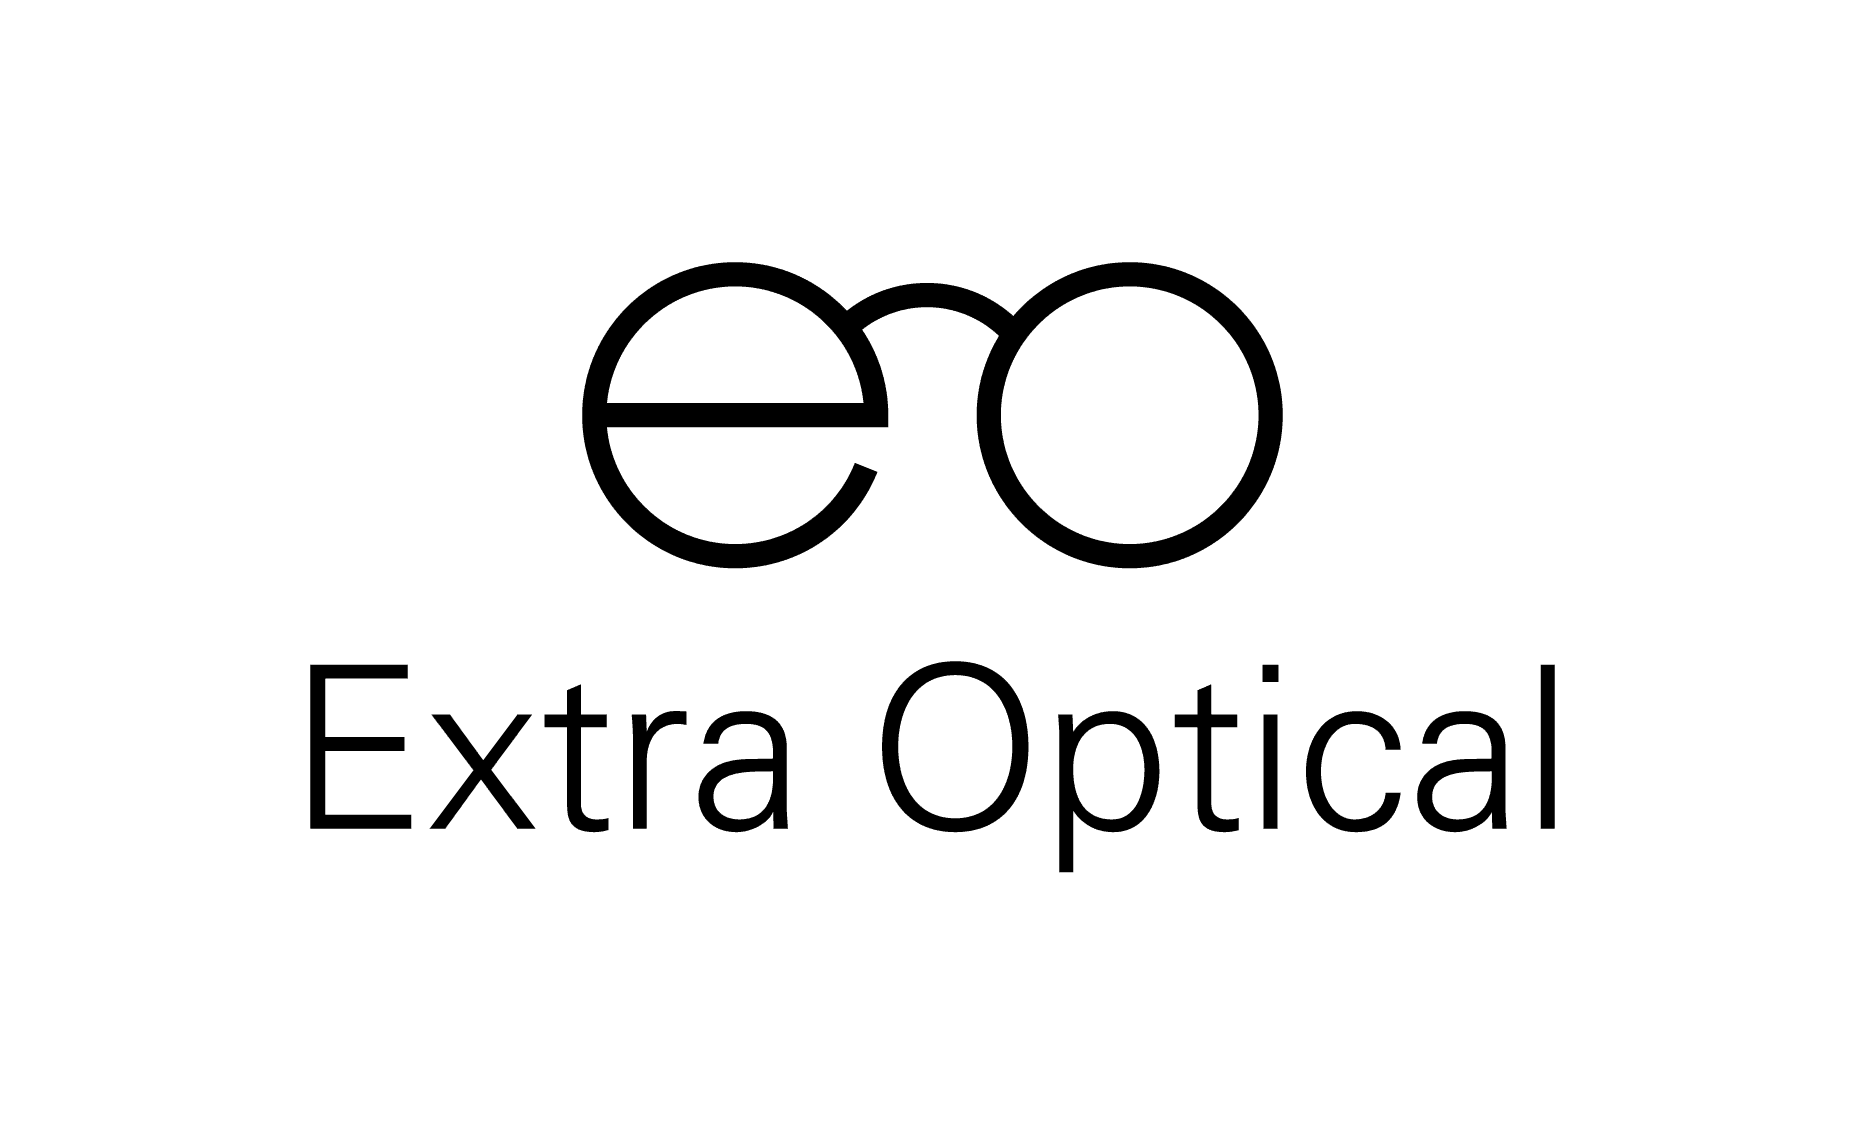 Extra Optical logo